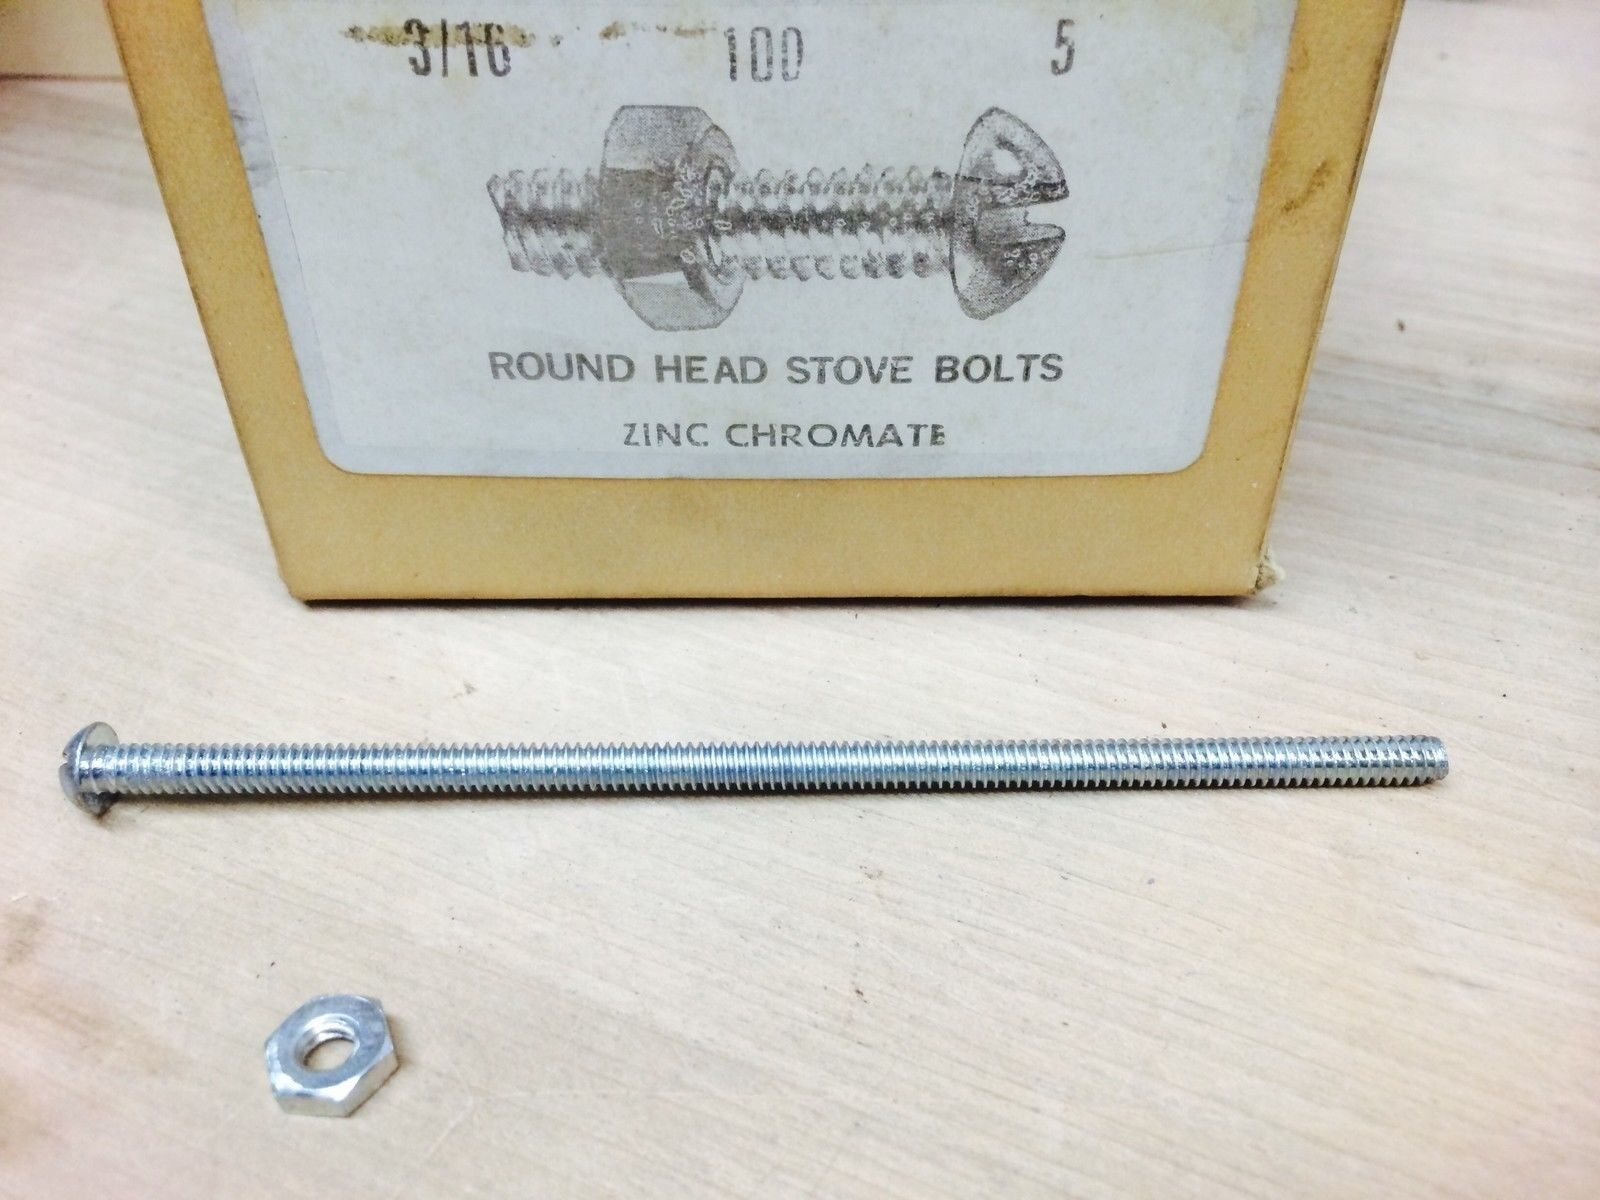 3 16 ROUND HEAD STOVE BOLTS 5  ZINC CHROMATE (NN0404-100)